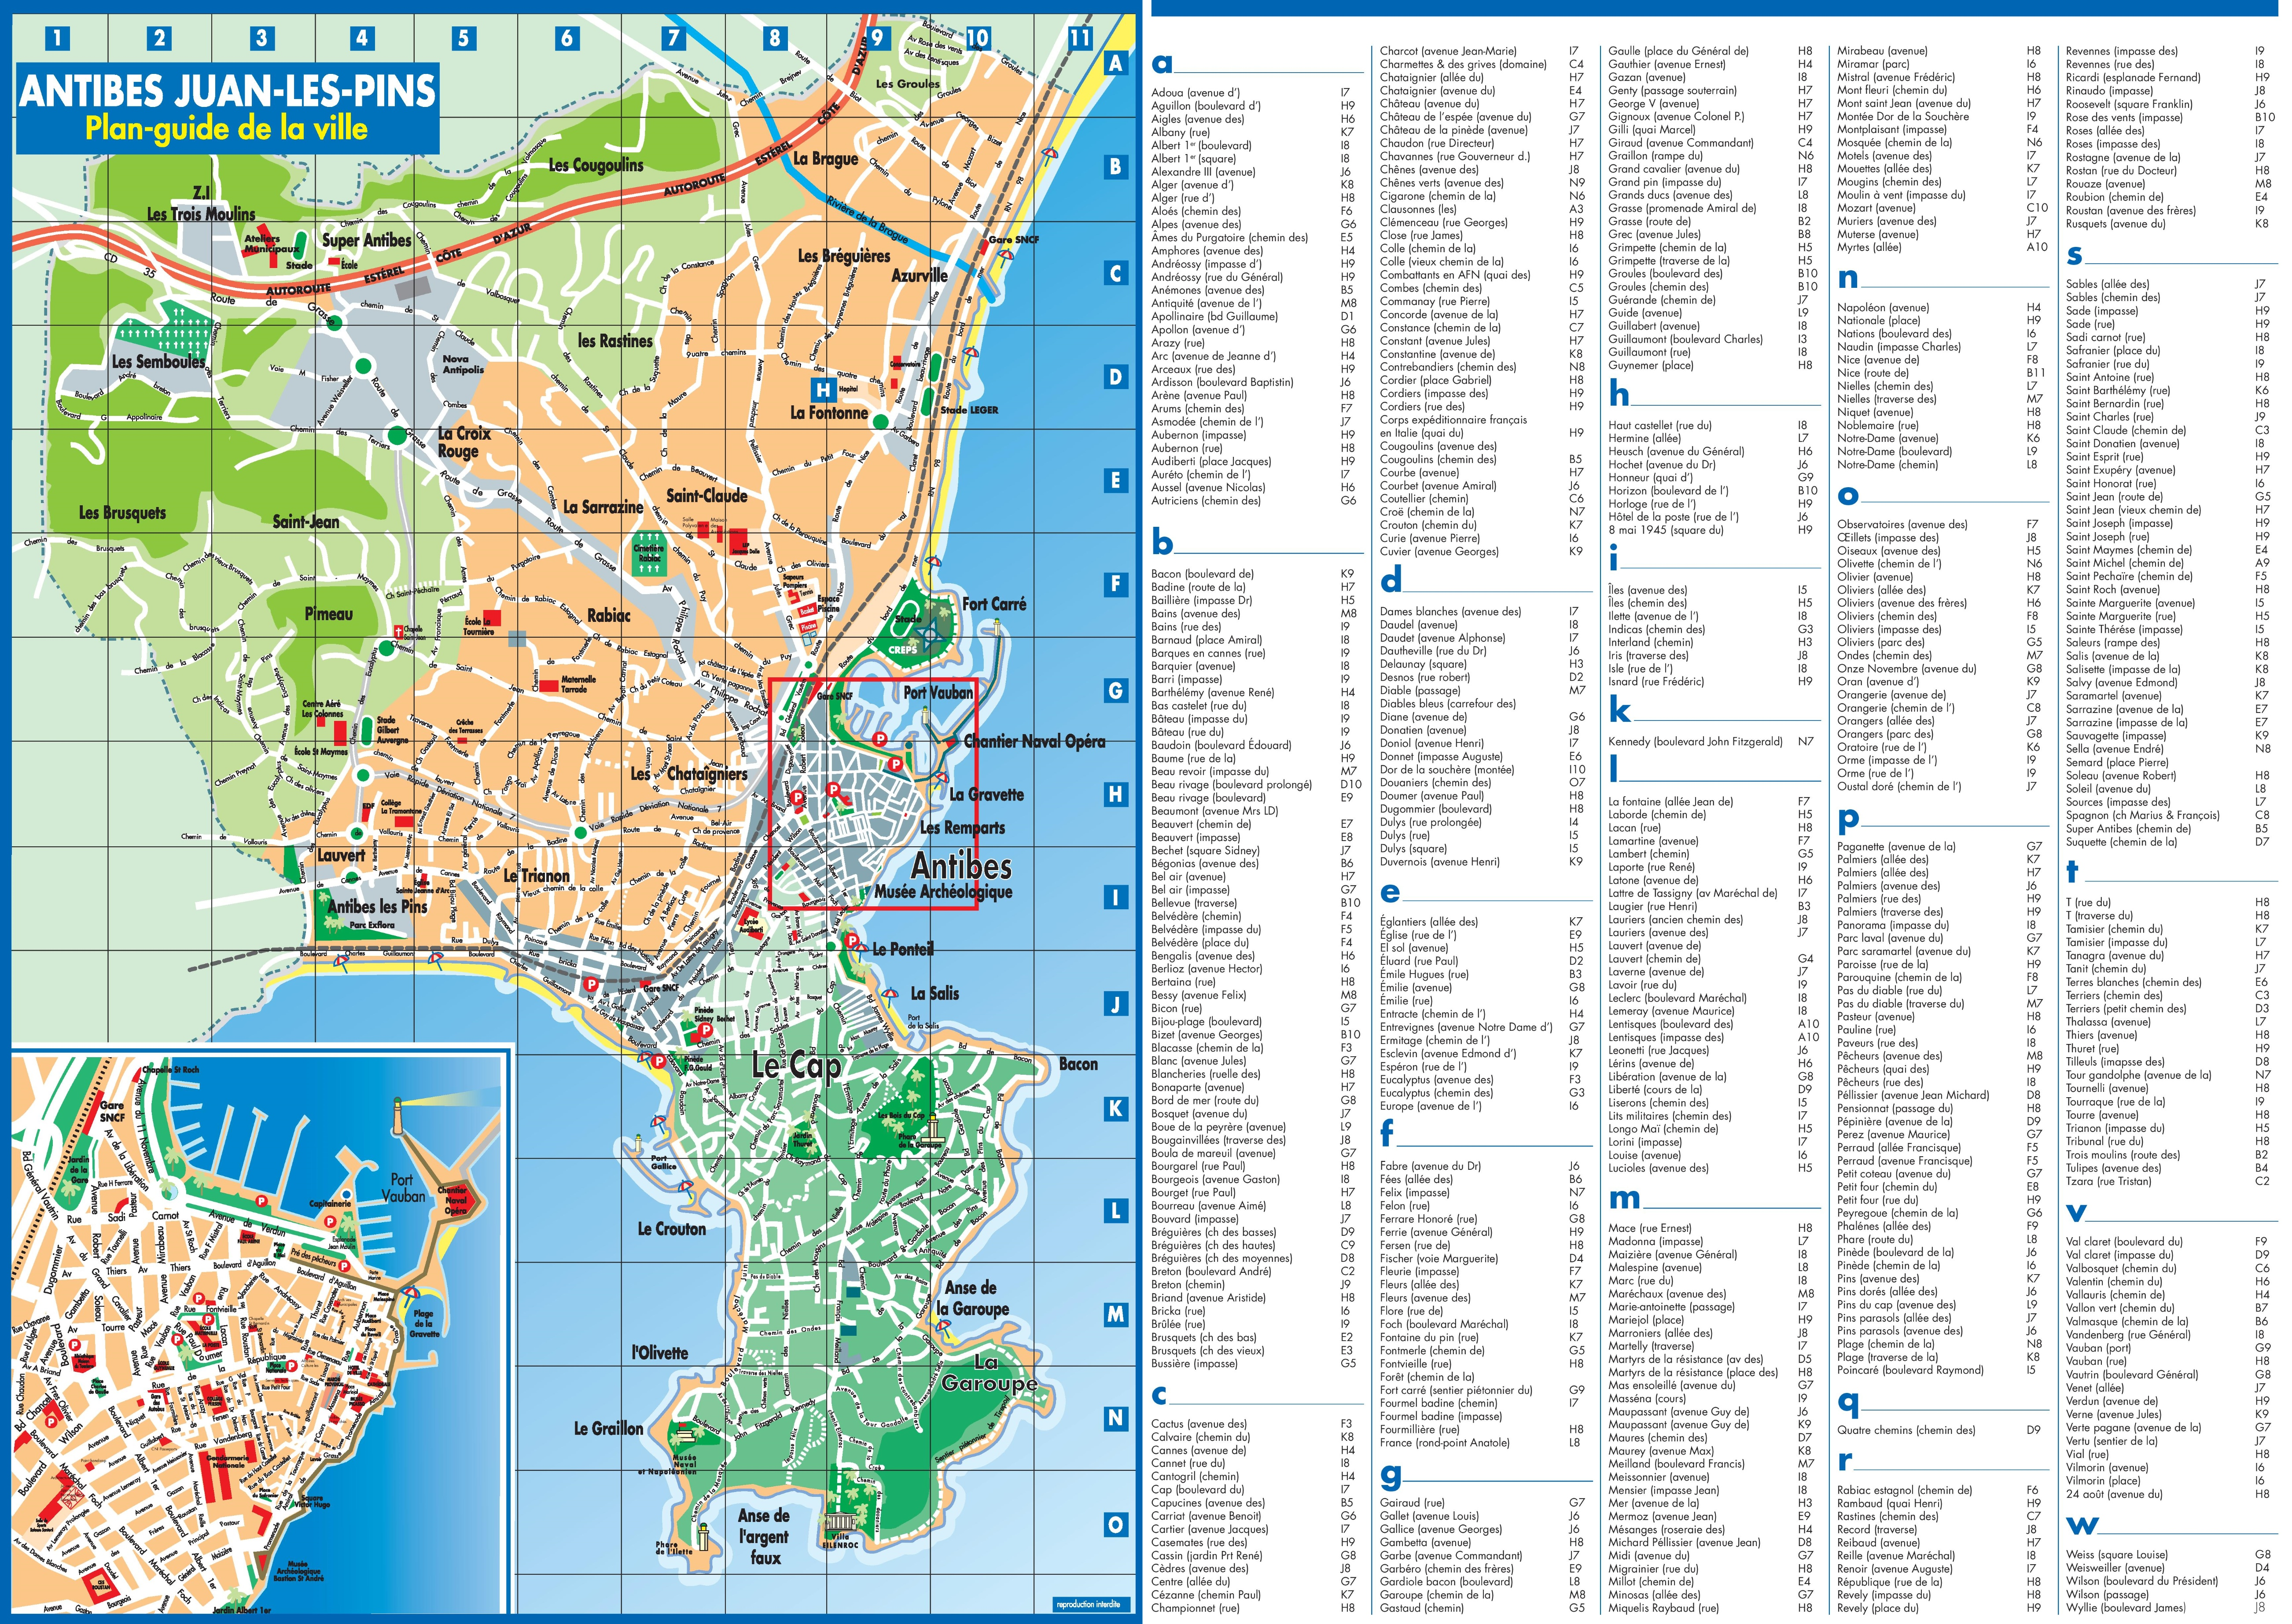 Antibes tourist map